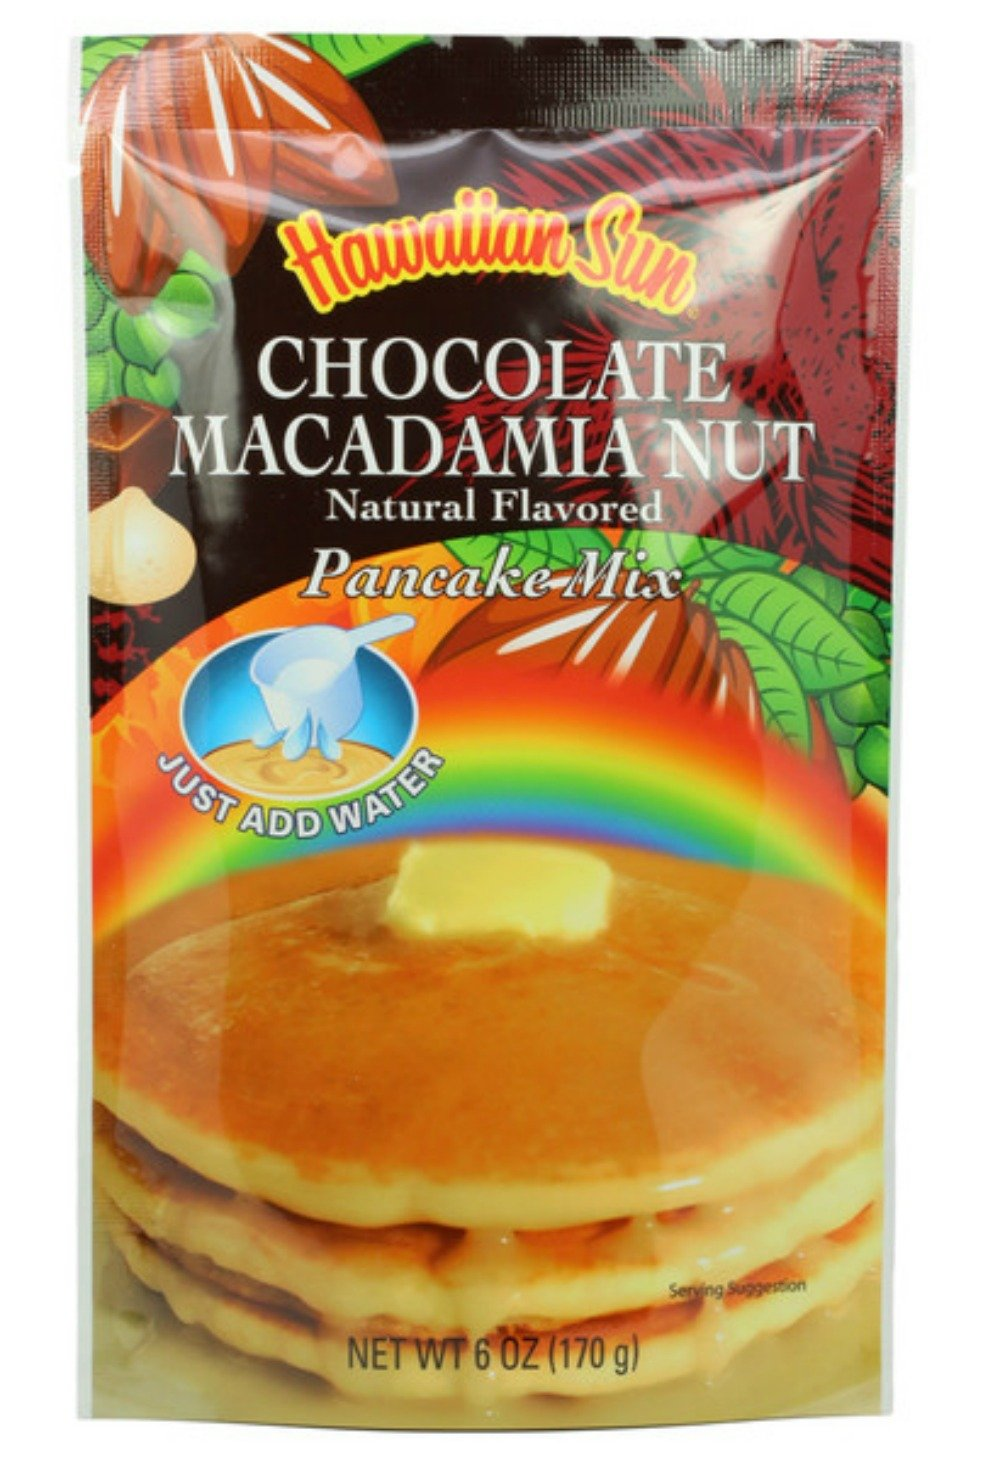 Hawaiian Sun 5 Pack Assorted Pancake Mix: Chocolate Mac, Passion Fruit, Banana Mac Nut, Coconut Pineapple. by Hawaiian Sun (Image #2)